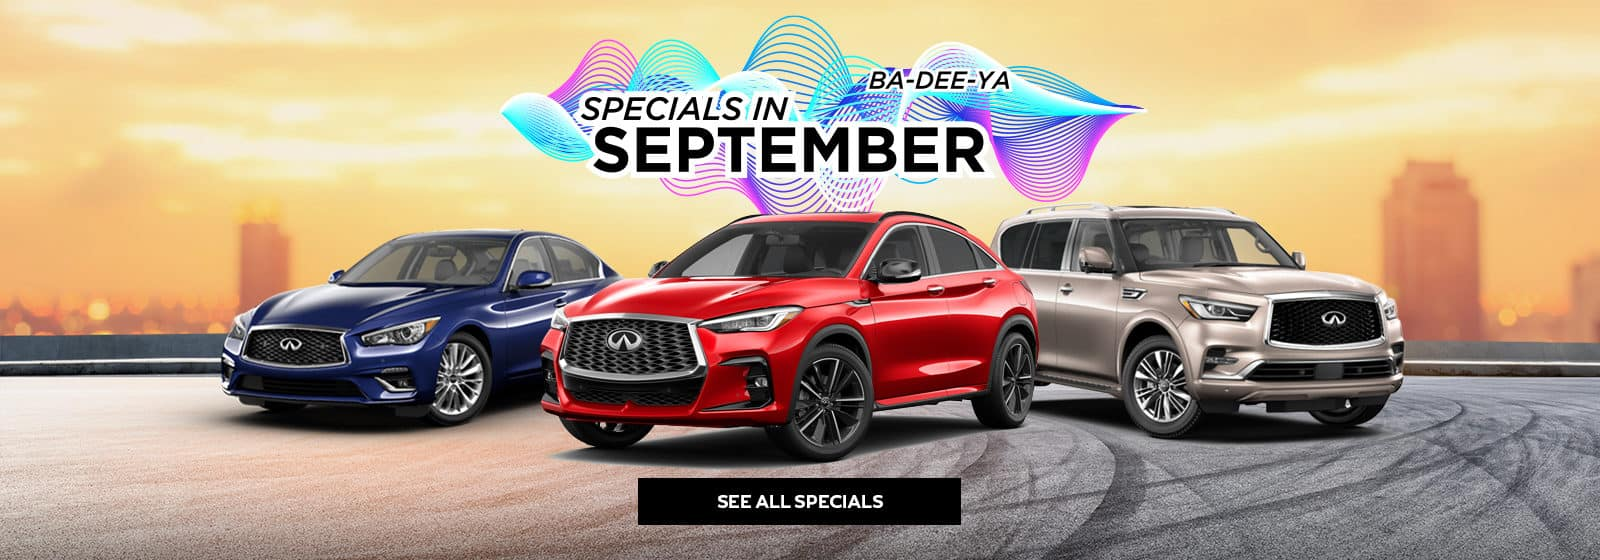 INFINITI September Specials line up of 3 models